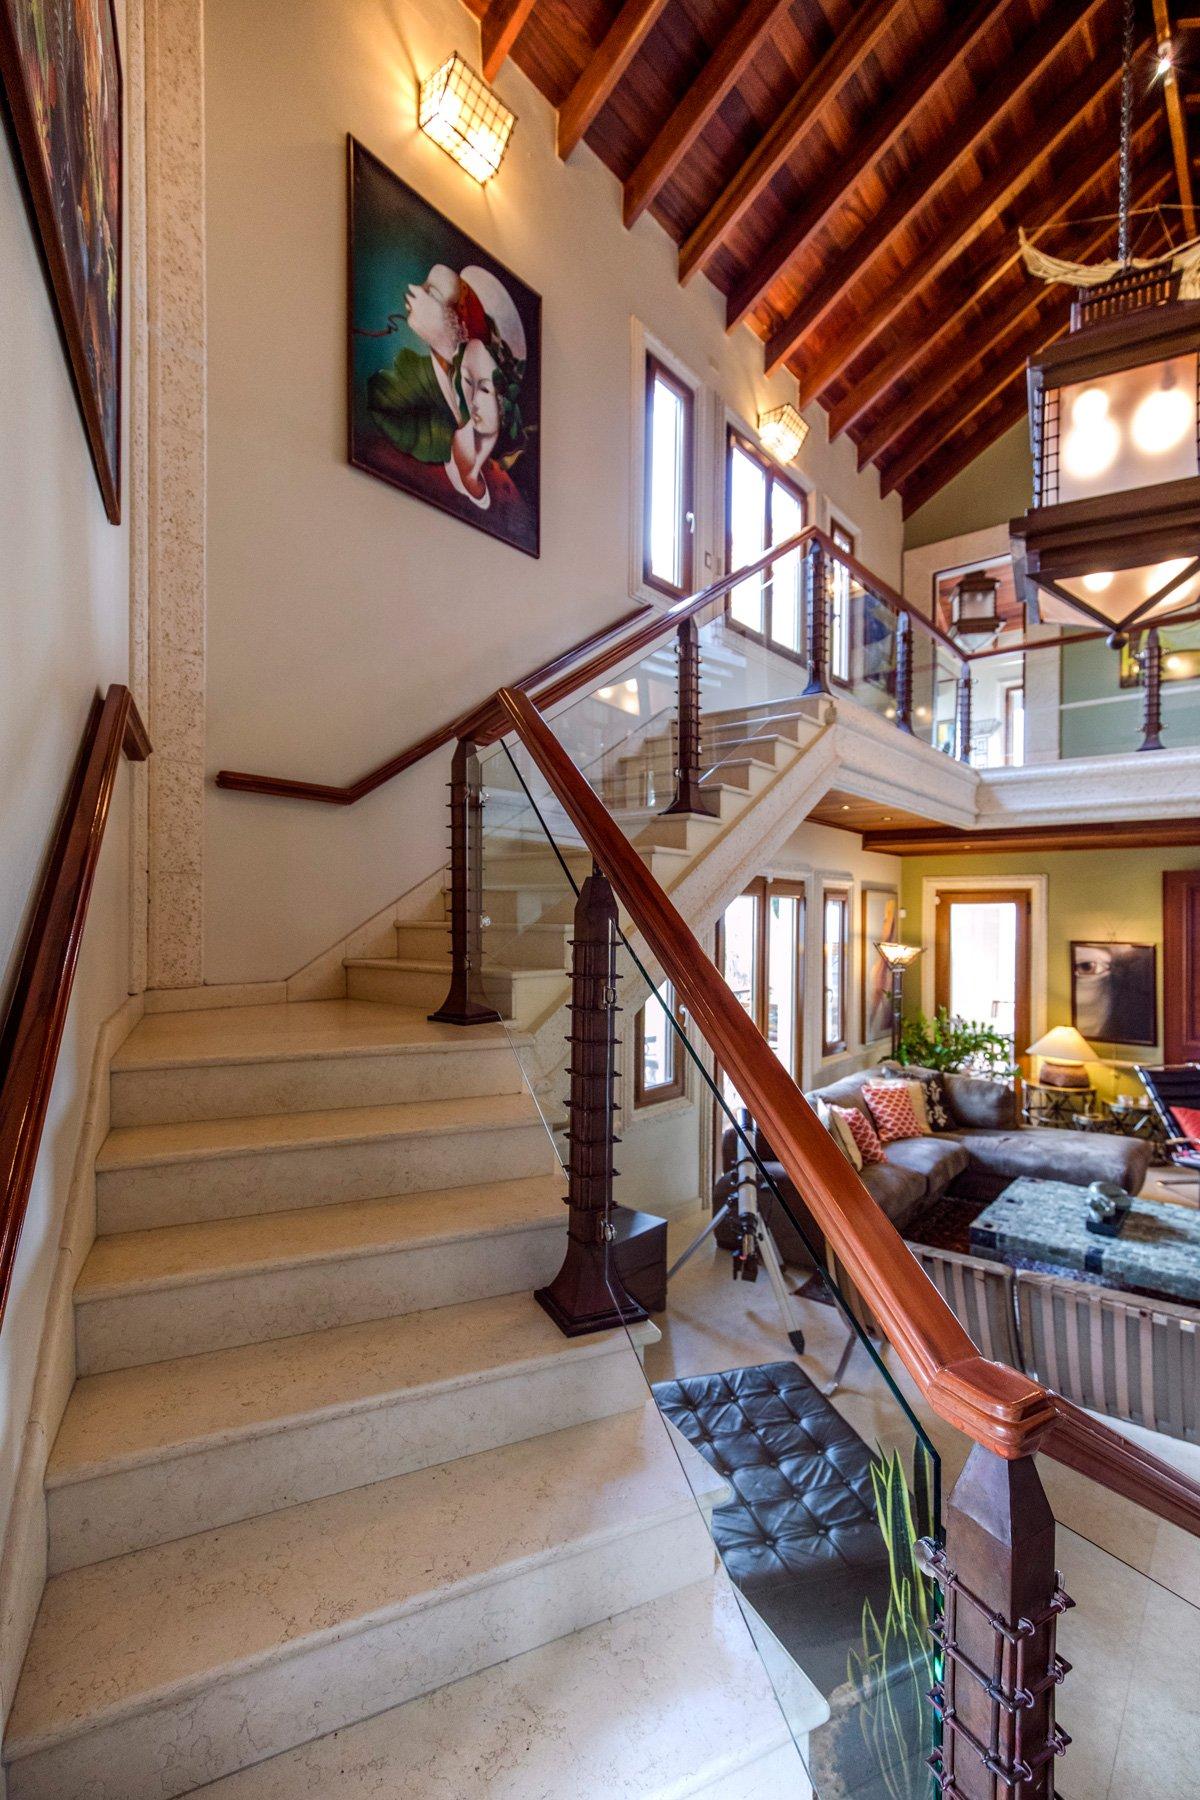 villa tuscany puerto rico | caribbean luxury rentals | creating